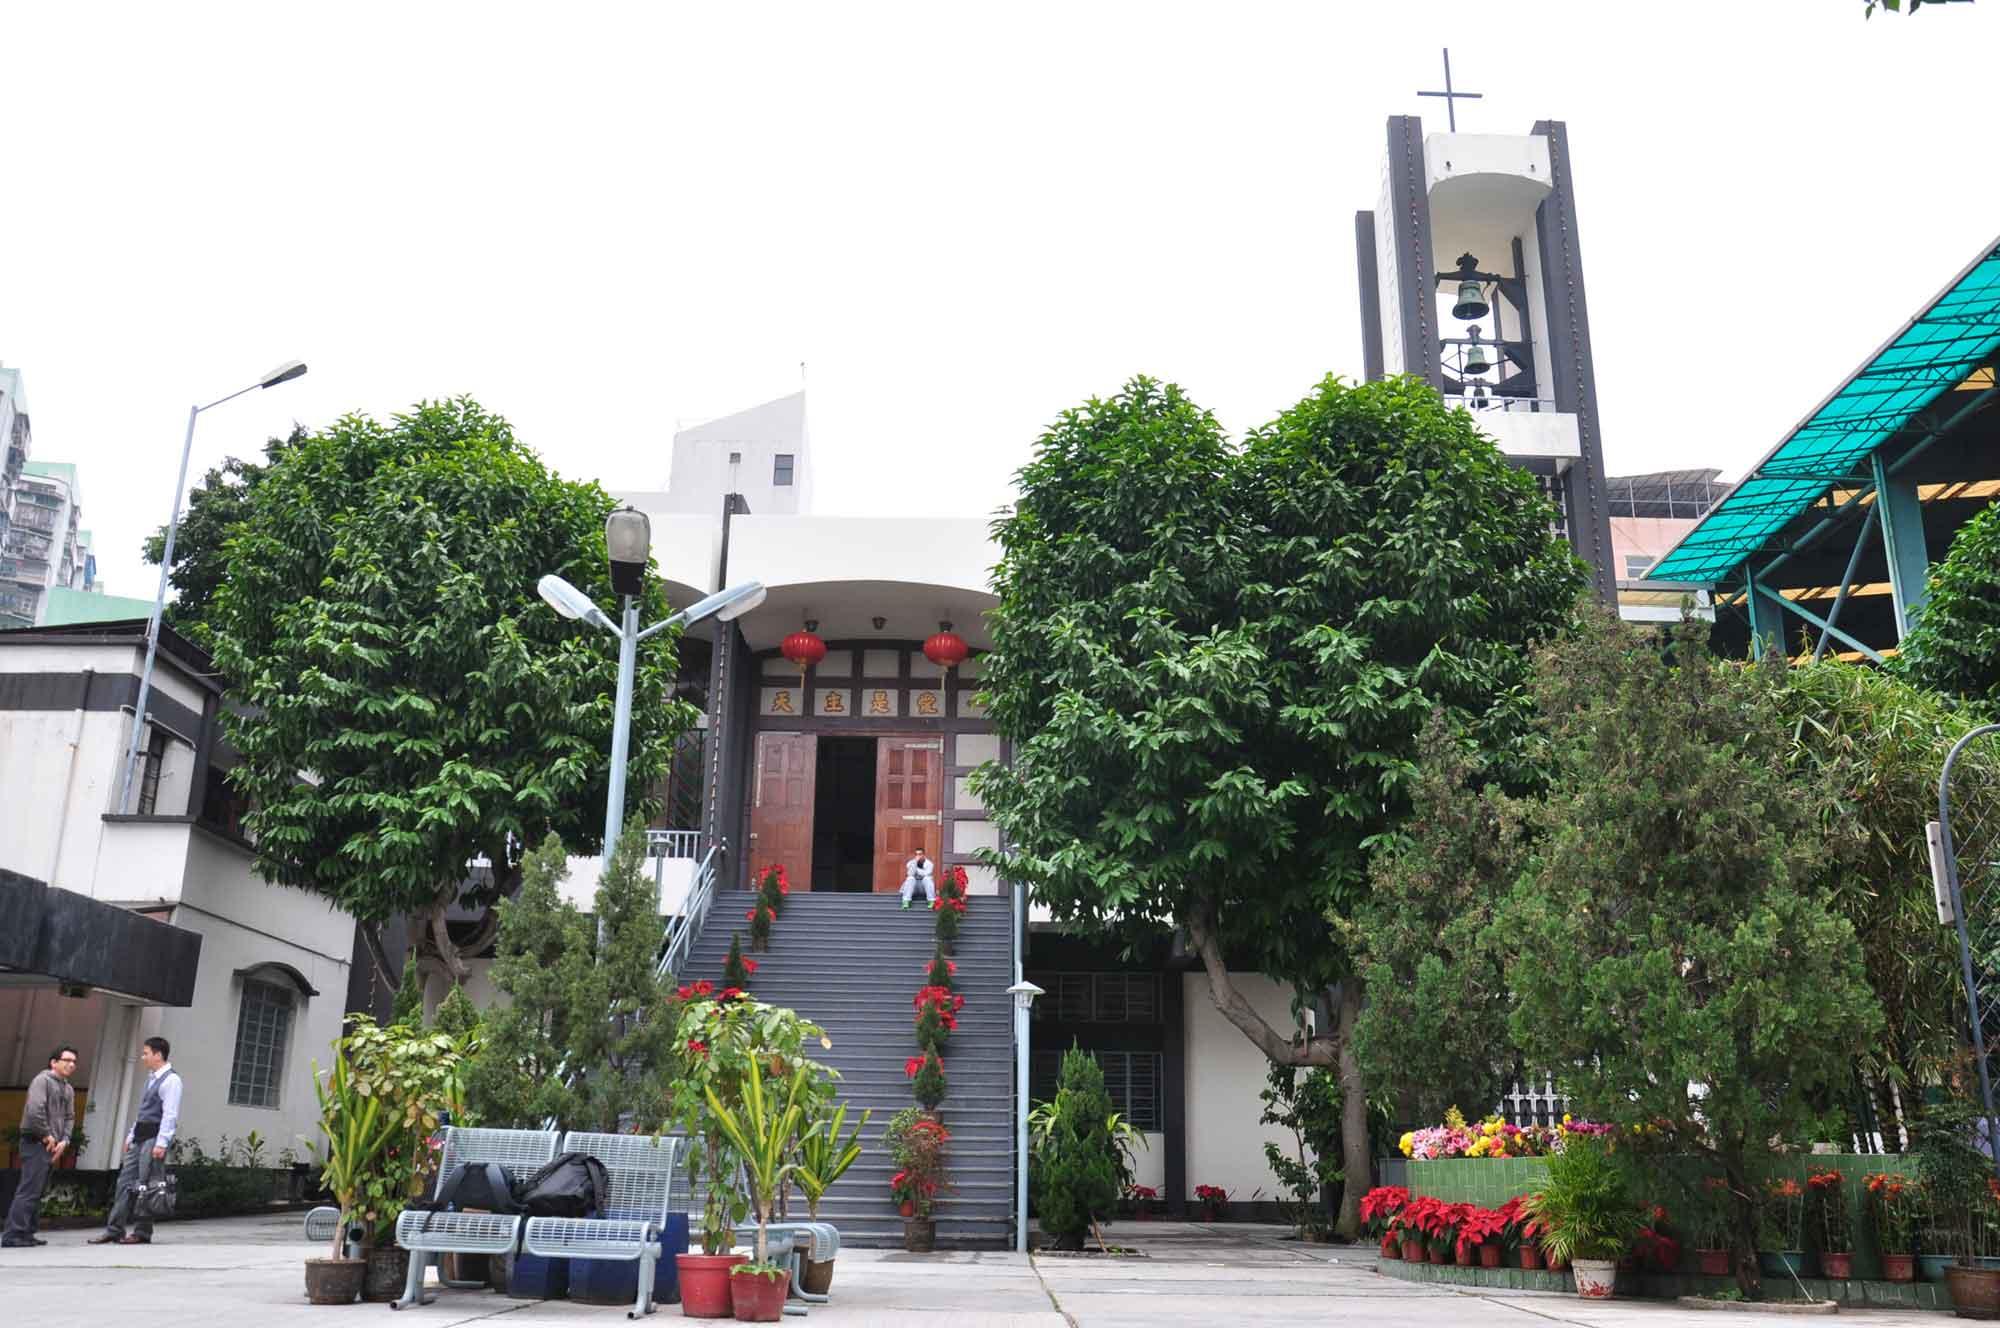 Macau Churches: Our Lady of Fatima